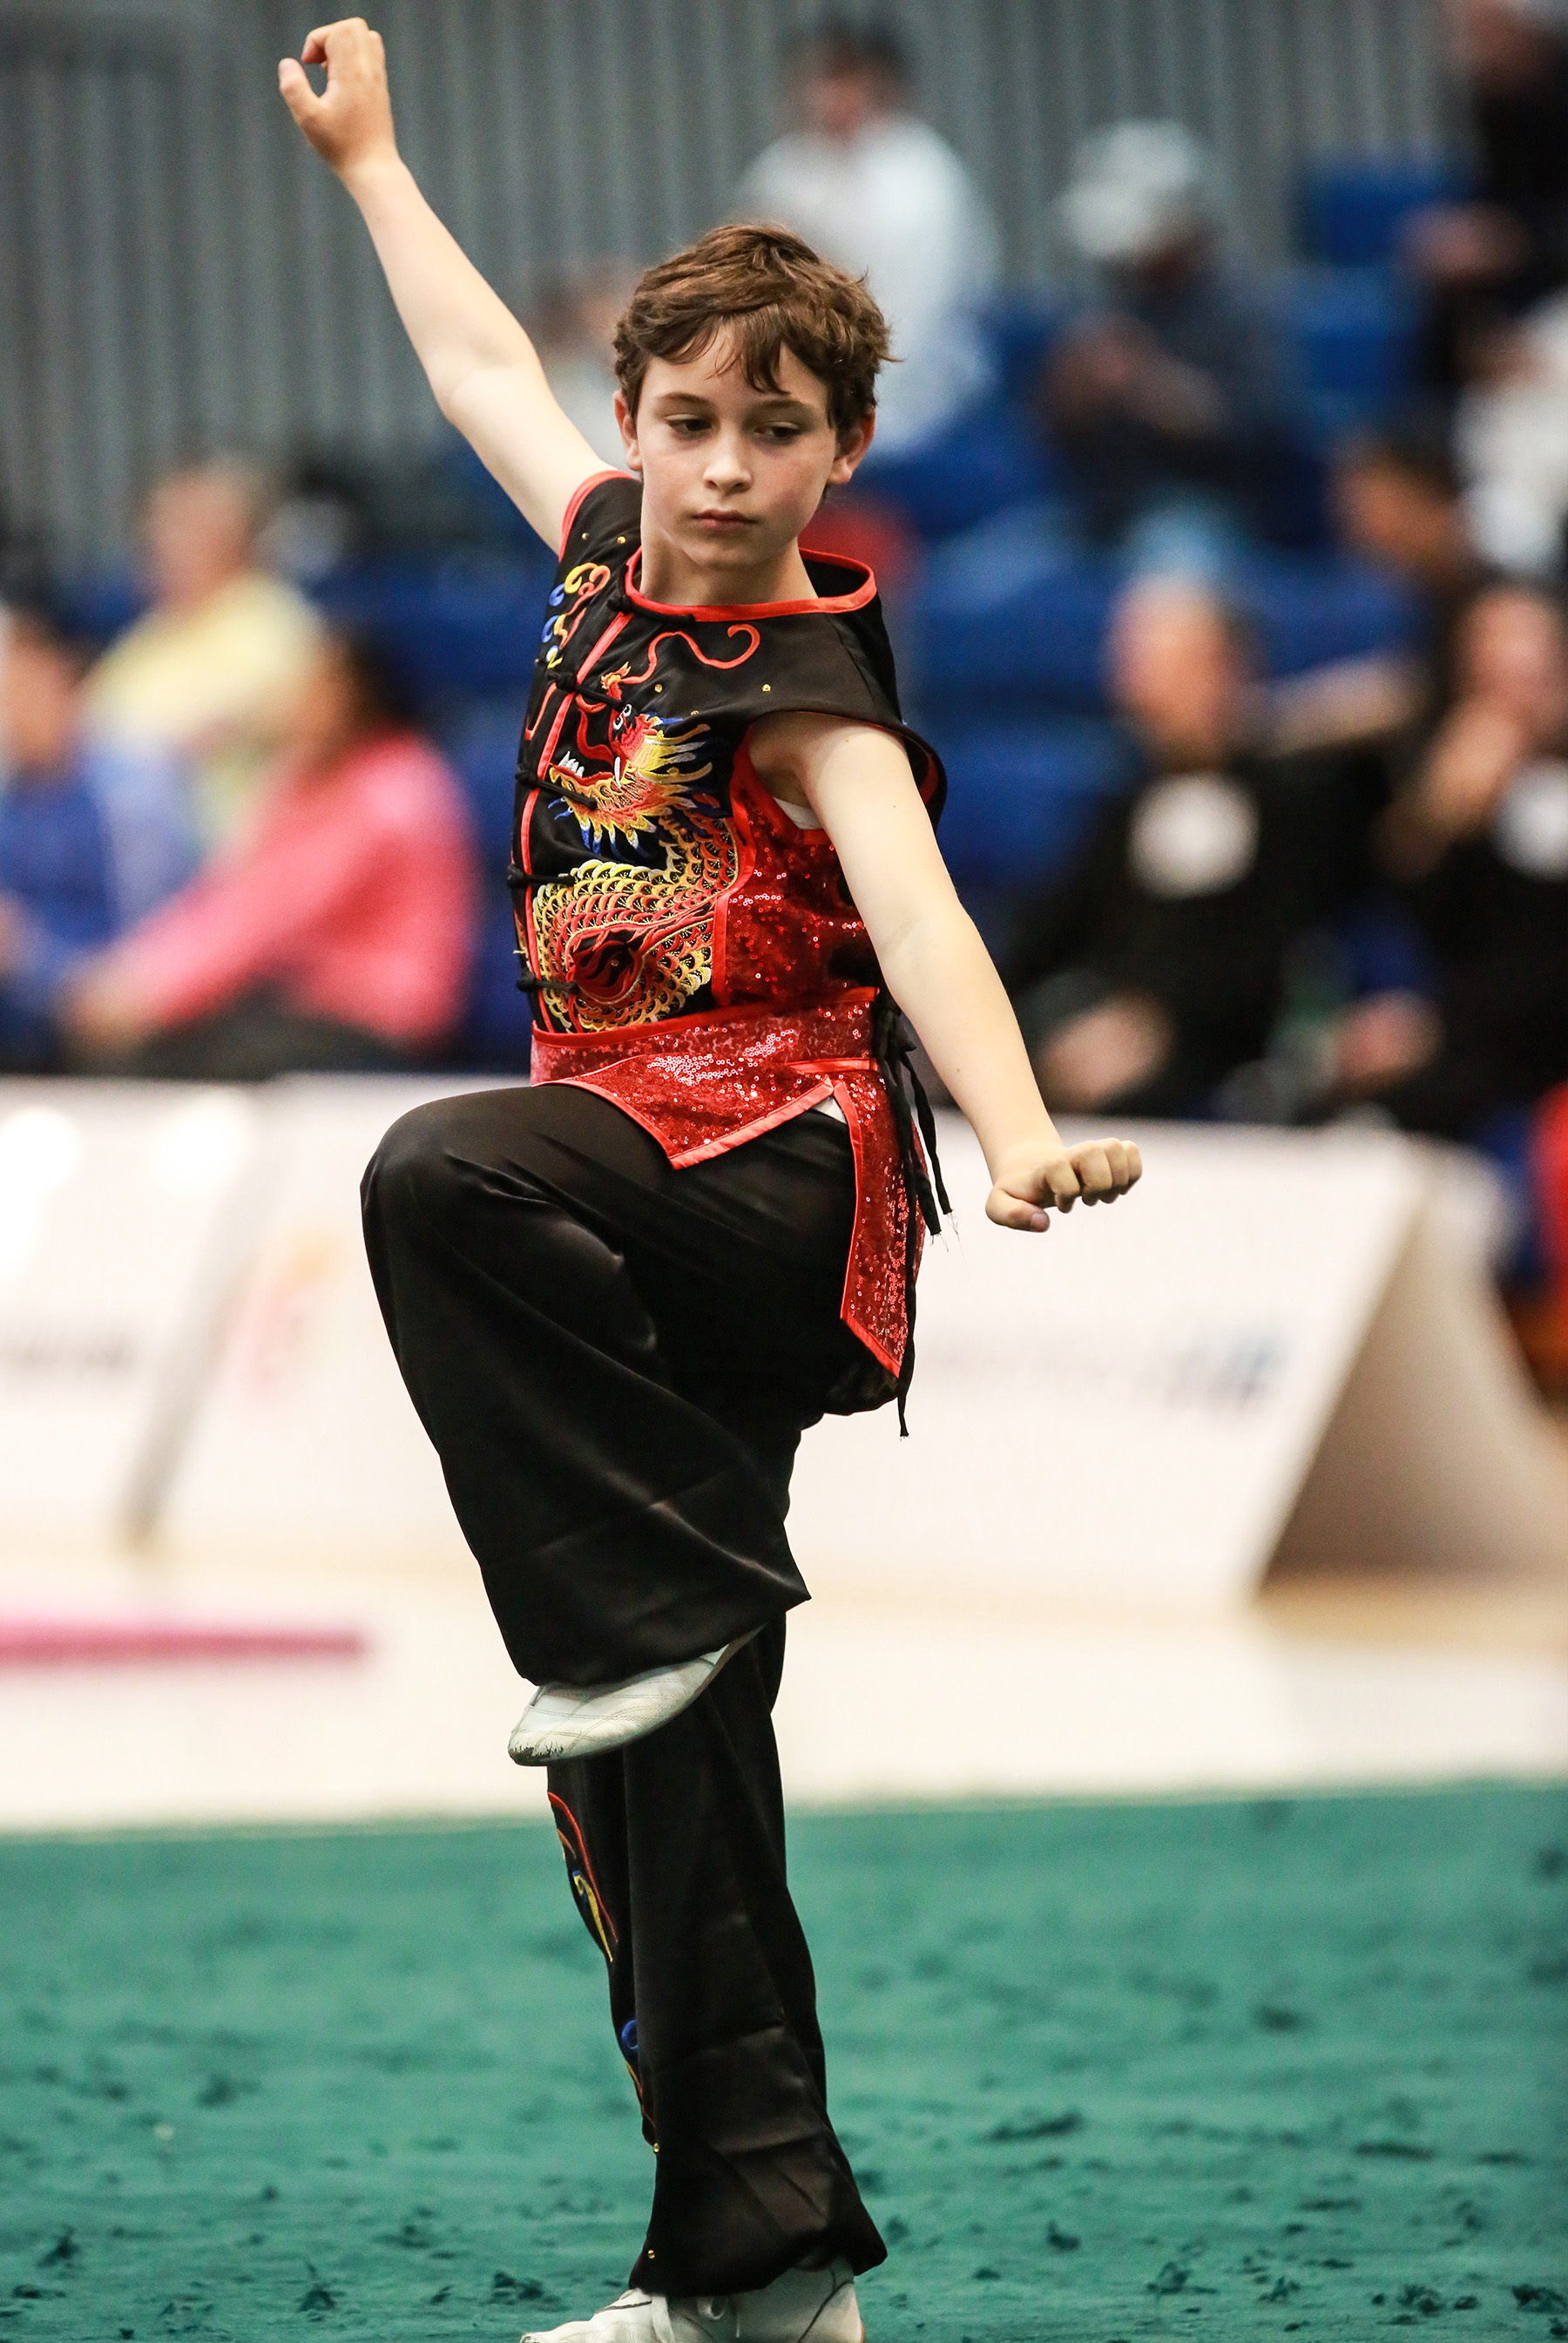 NZ Wushu 2019 Champs- Mario Vigorelli co